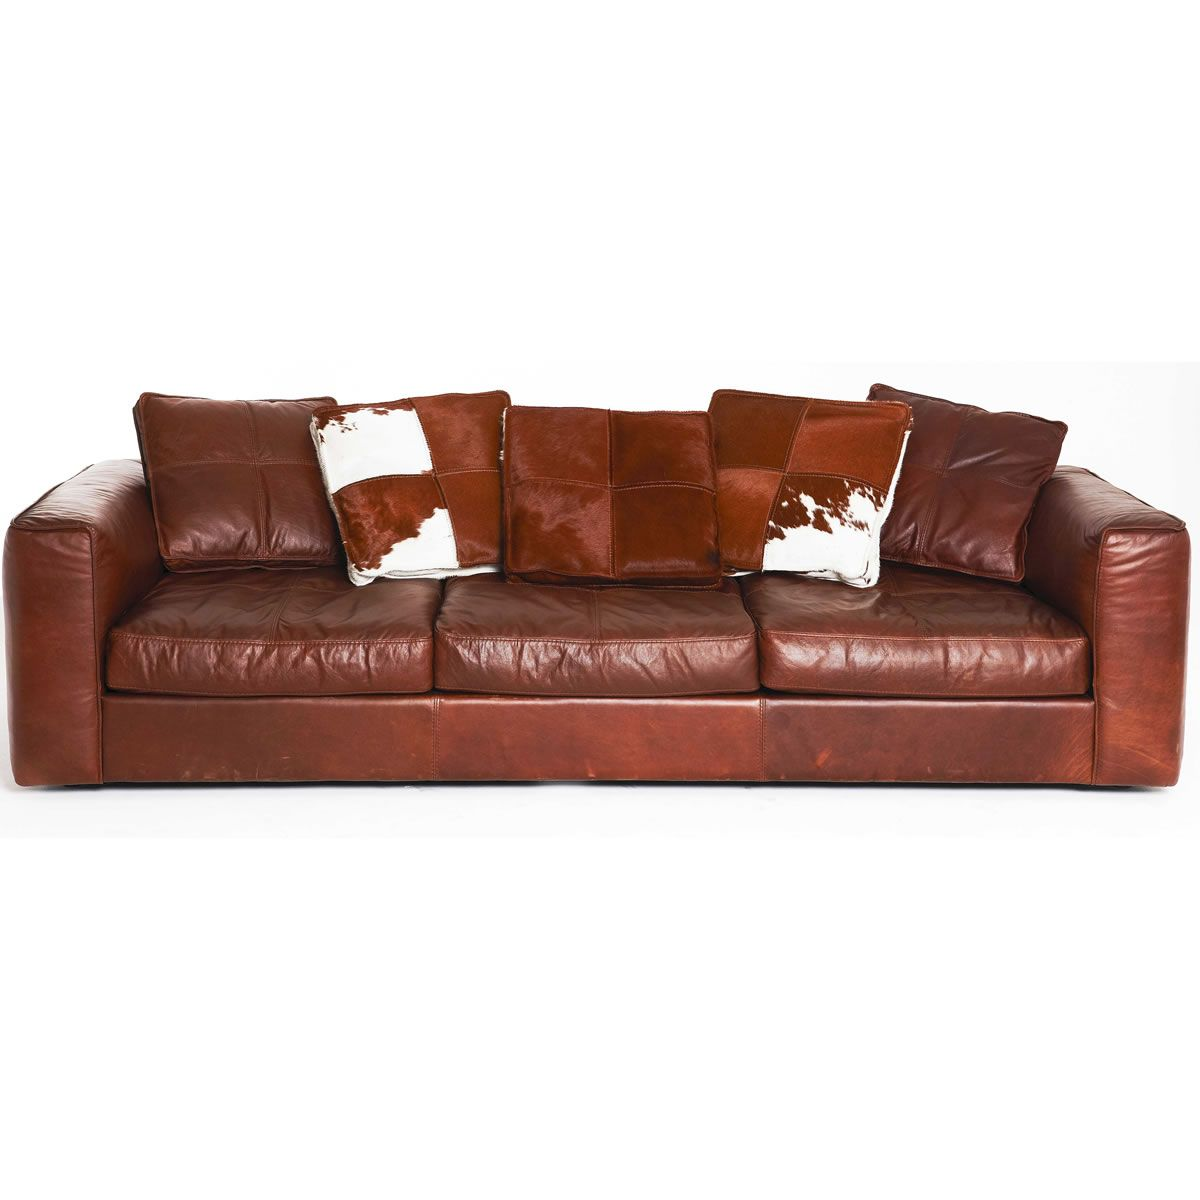 Sectional Sofas Kijiji Calgary With Chaise Lounge And Ottoman Comfy Leather Sofa Free Stuff